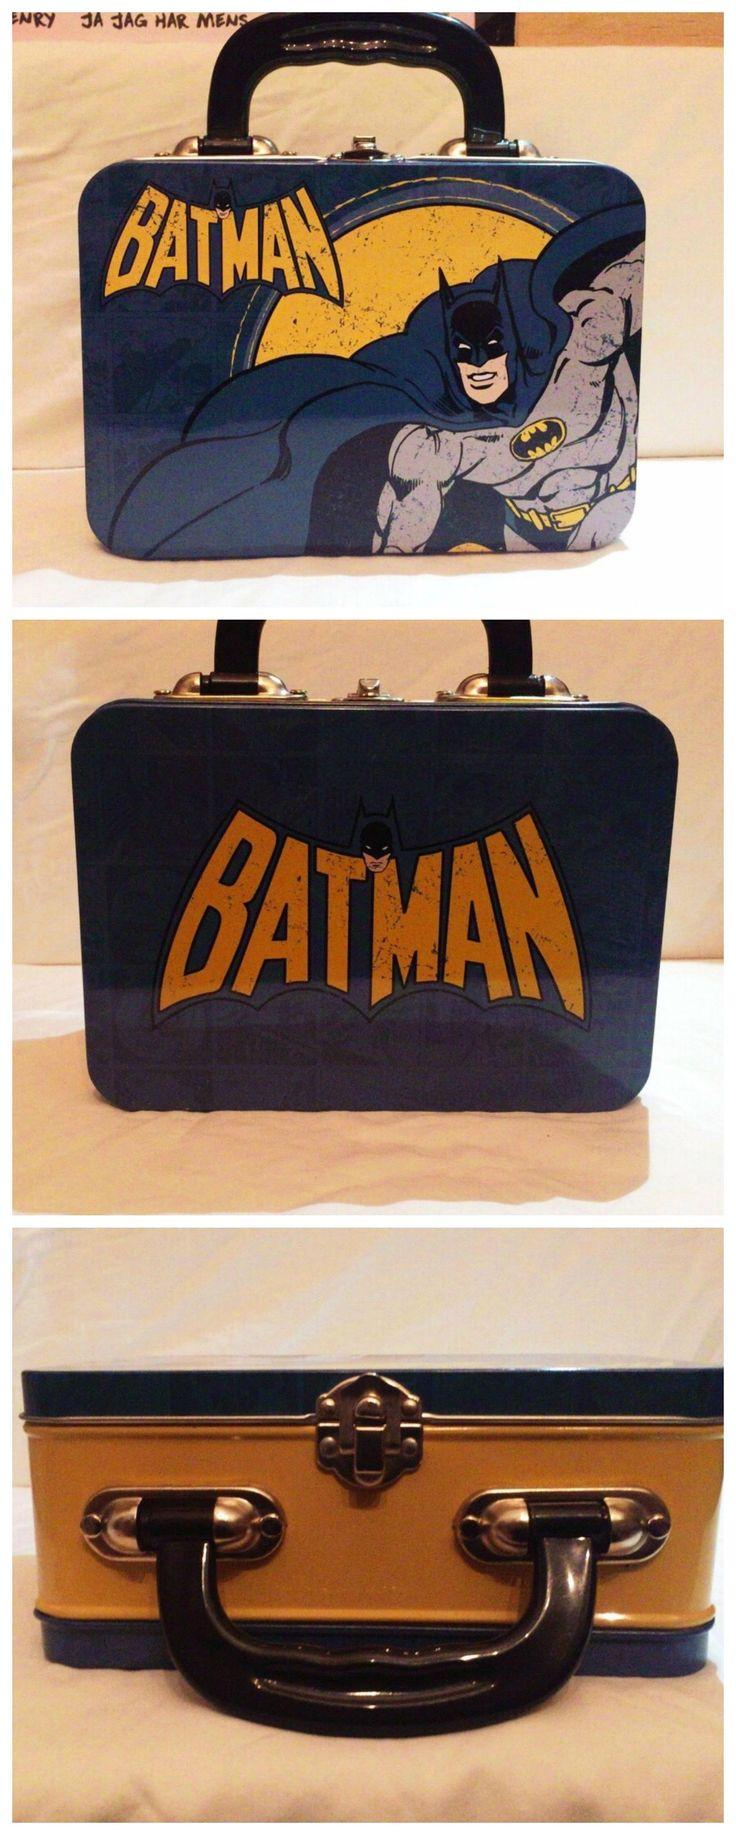 Retro Batman lunch box